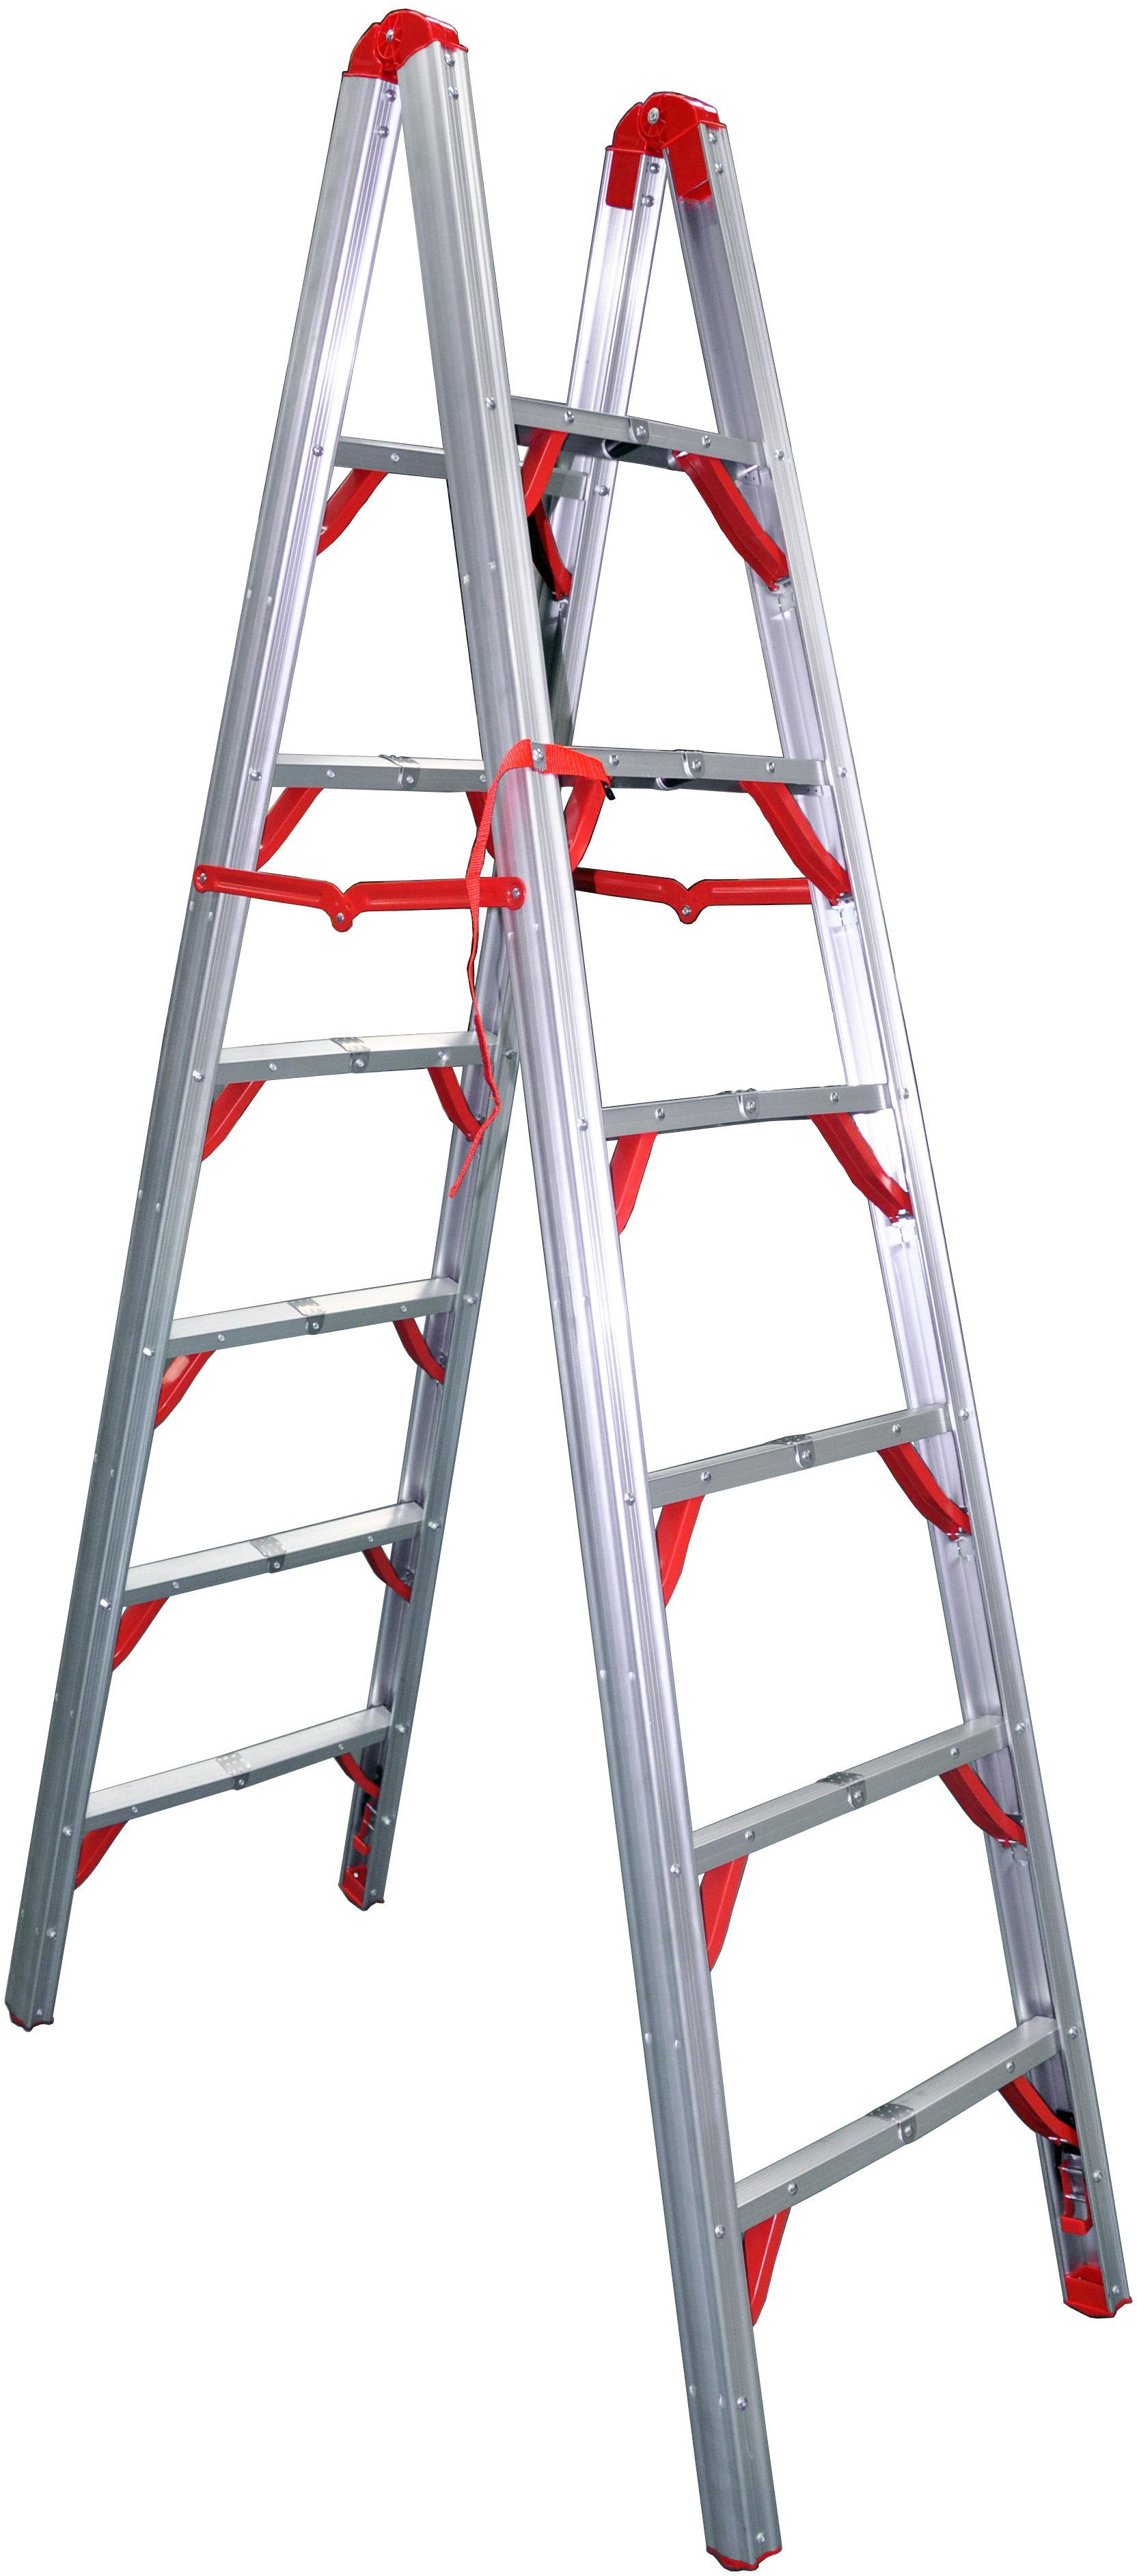 Telesteps Double Sided Folding 7 Ft Aluminum Step Ladder With 250 Lb Load Capacity Wayfair